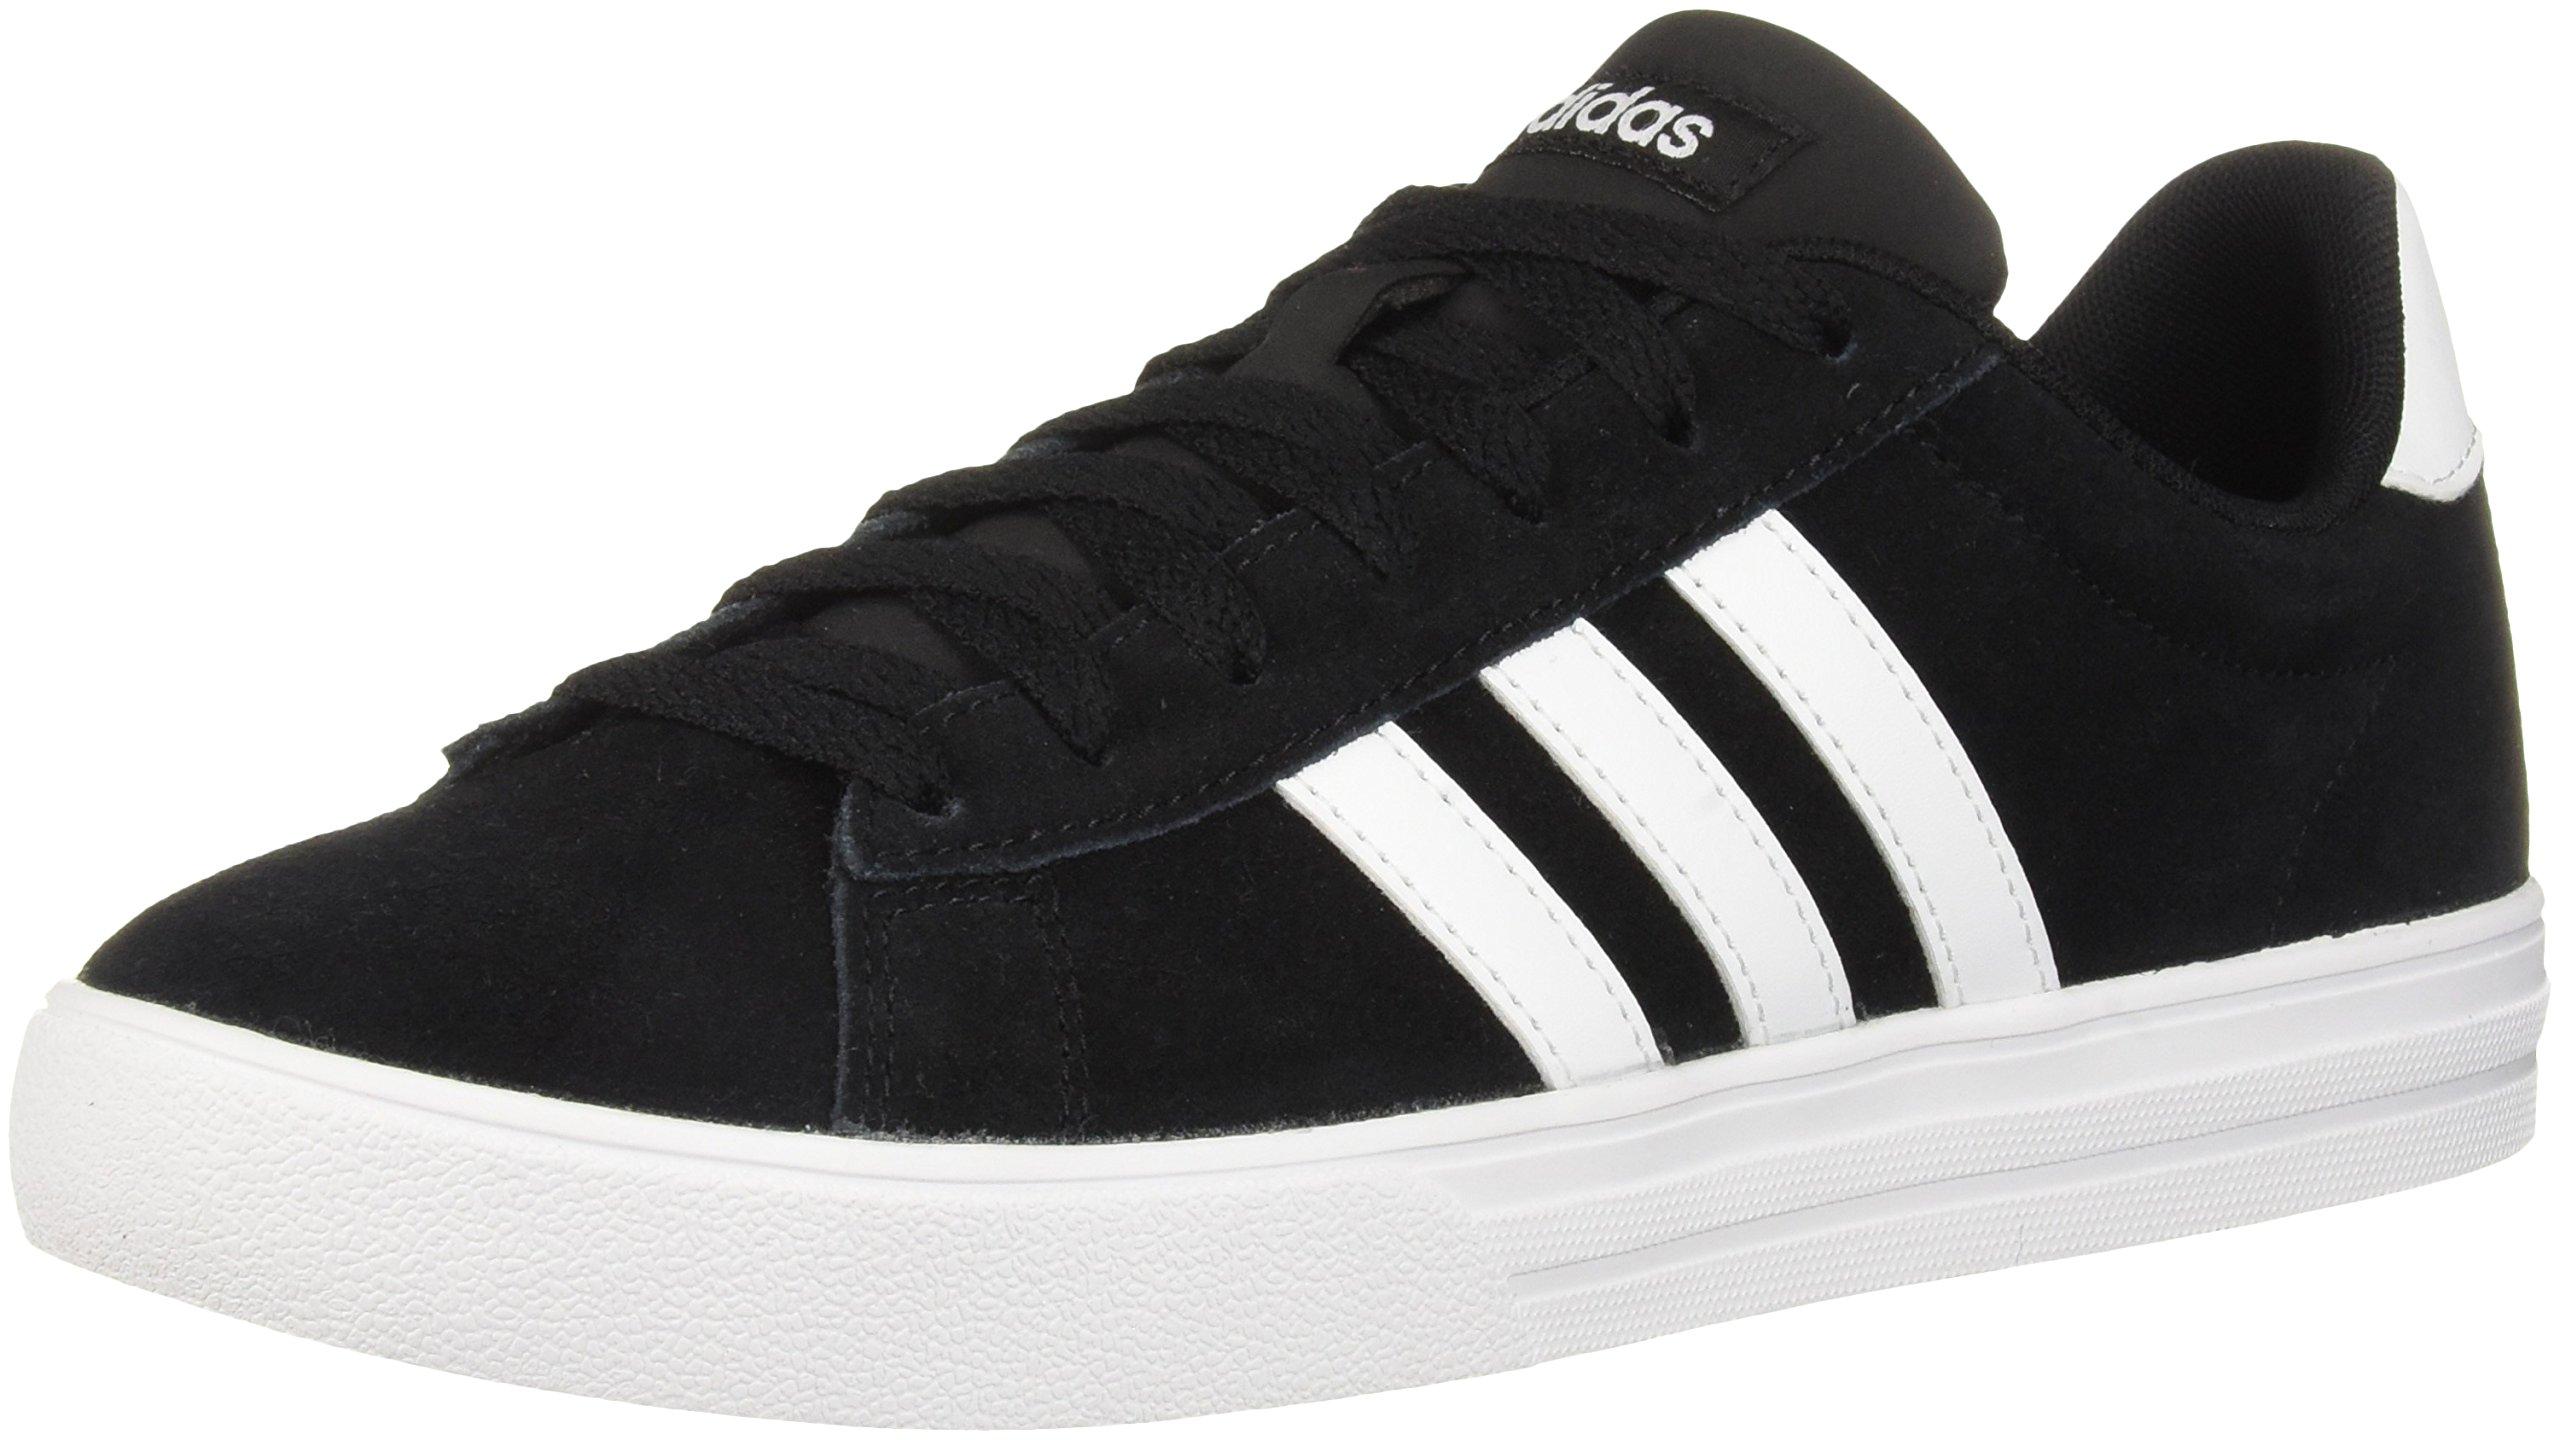 adidas Men's Daily 2.0 Sneaker, Black White, 11 M US